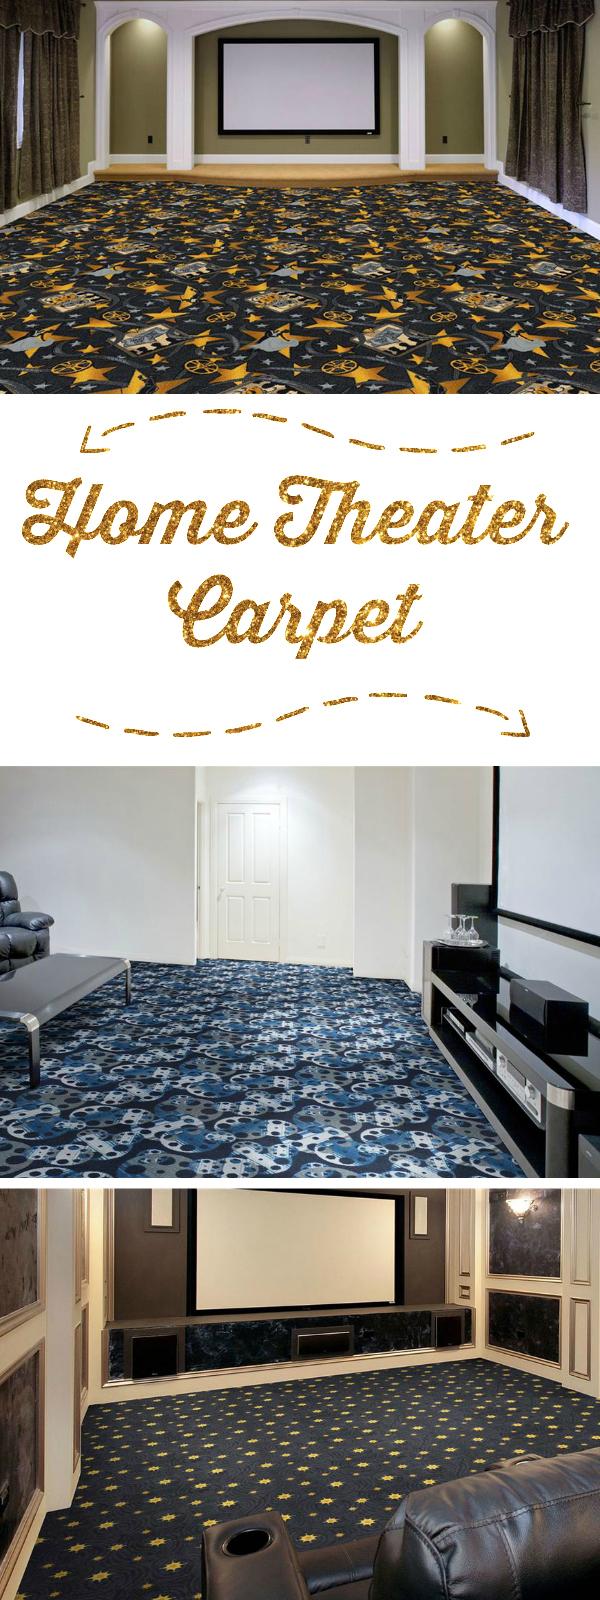 Best Kitchen Gallery: The Best Home Theater Carpet For Looks Sound Flooringinc Blog of Home Theater Room Carpet on rachelxblog.com